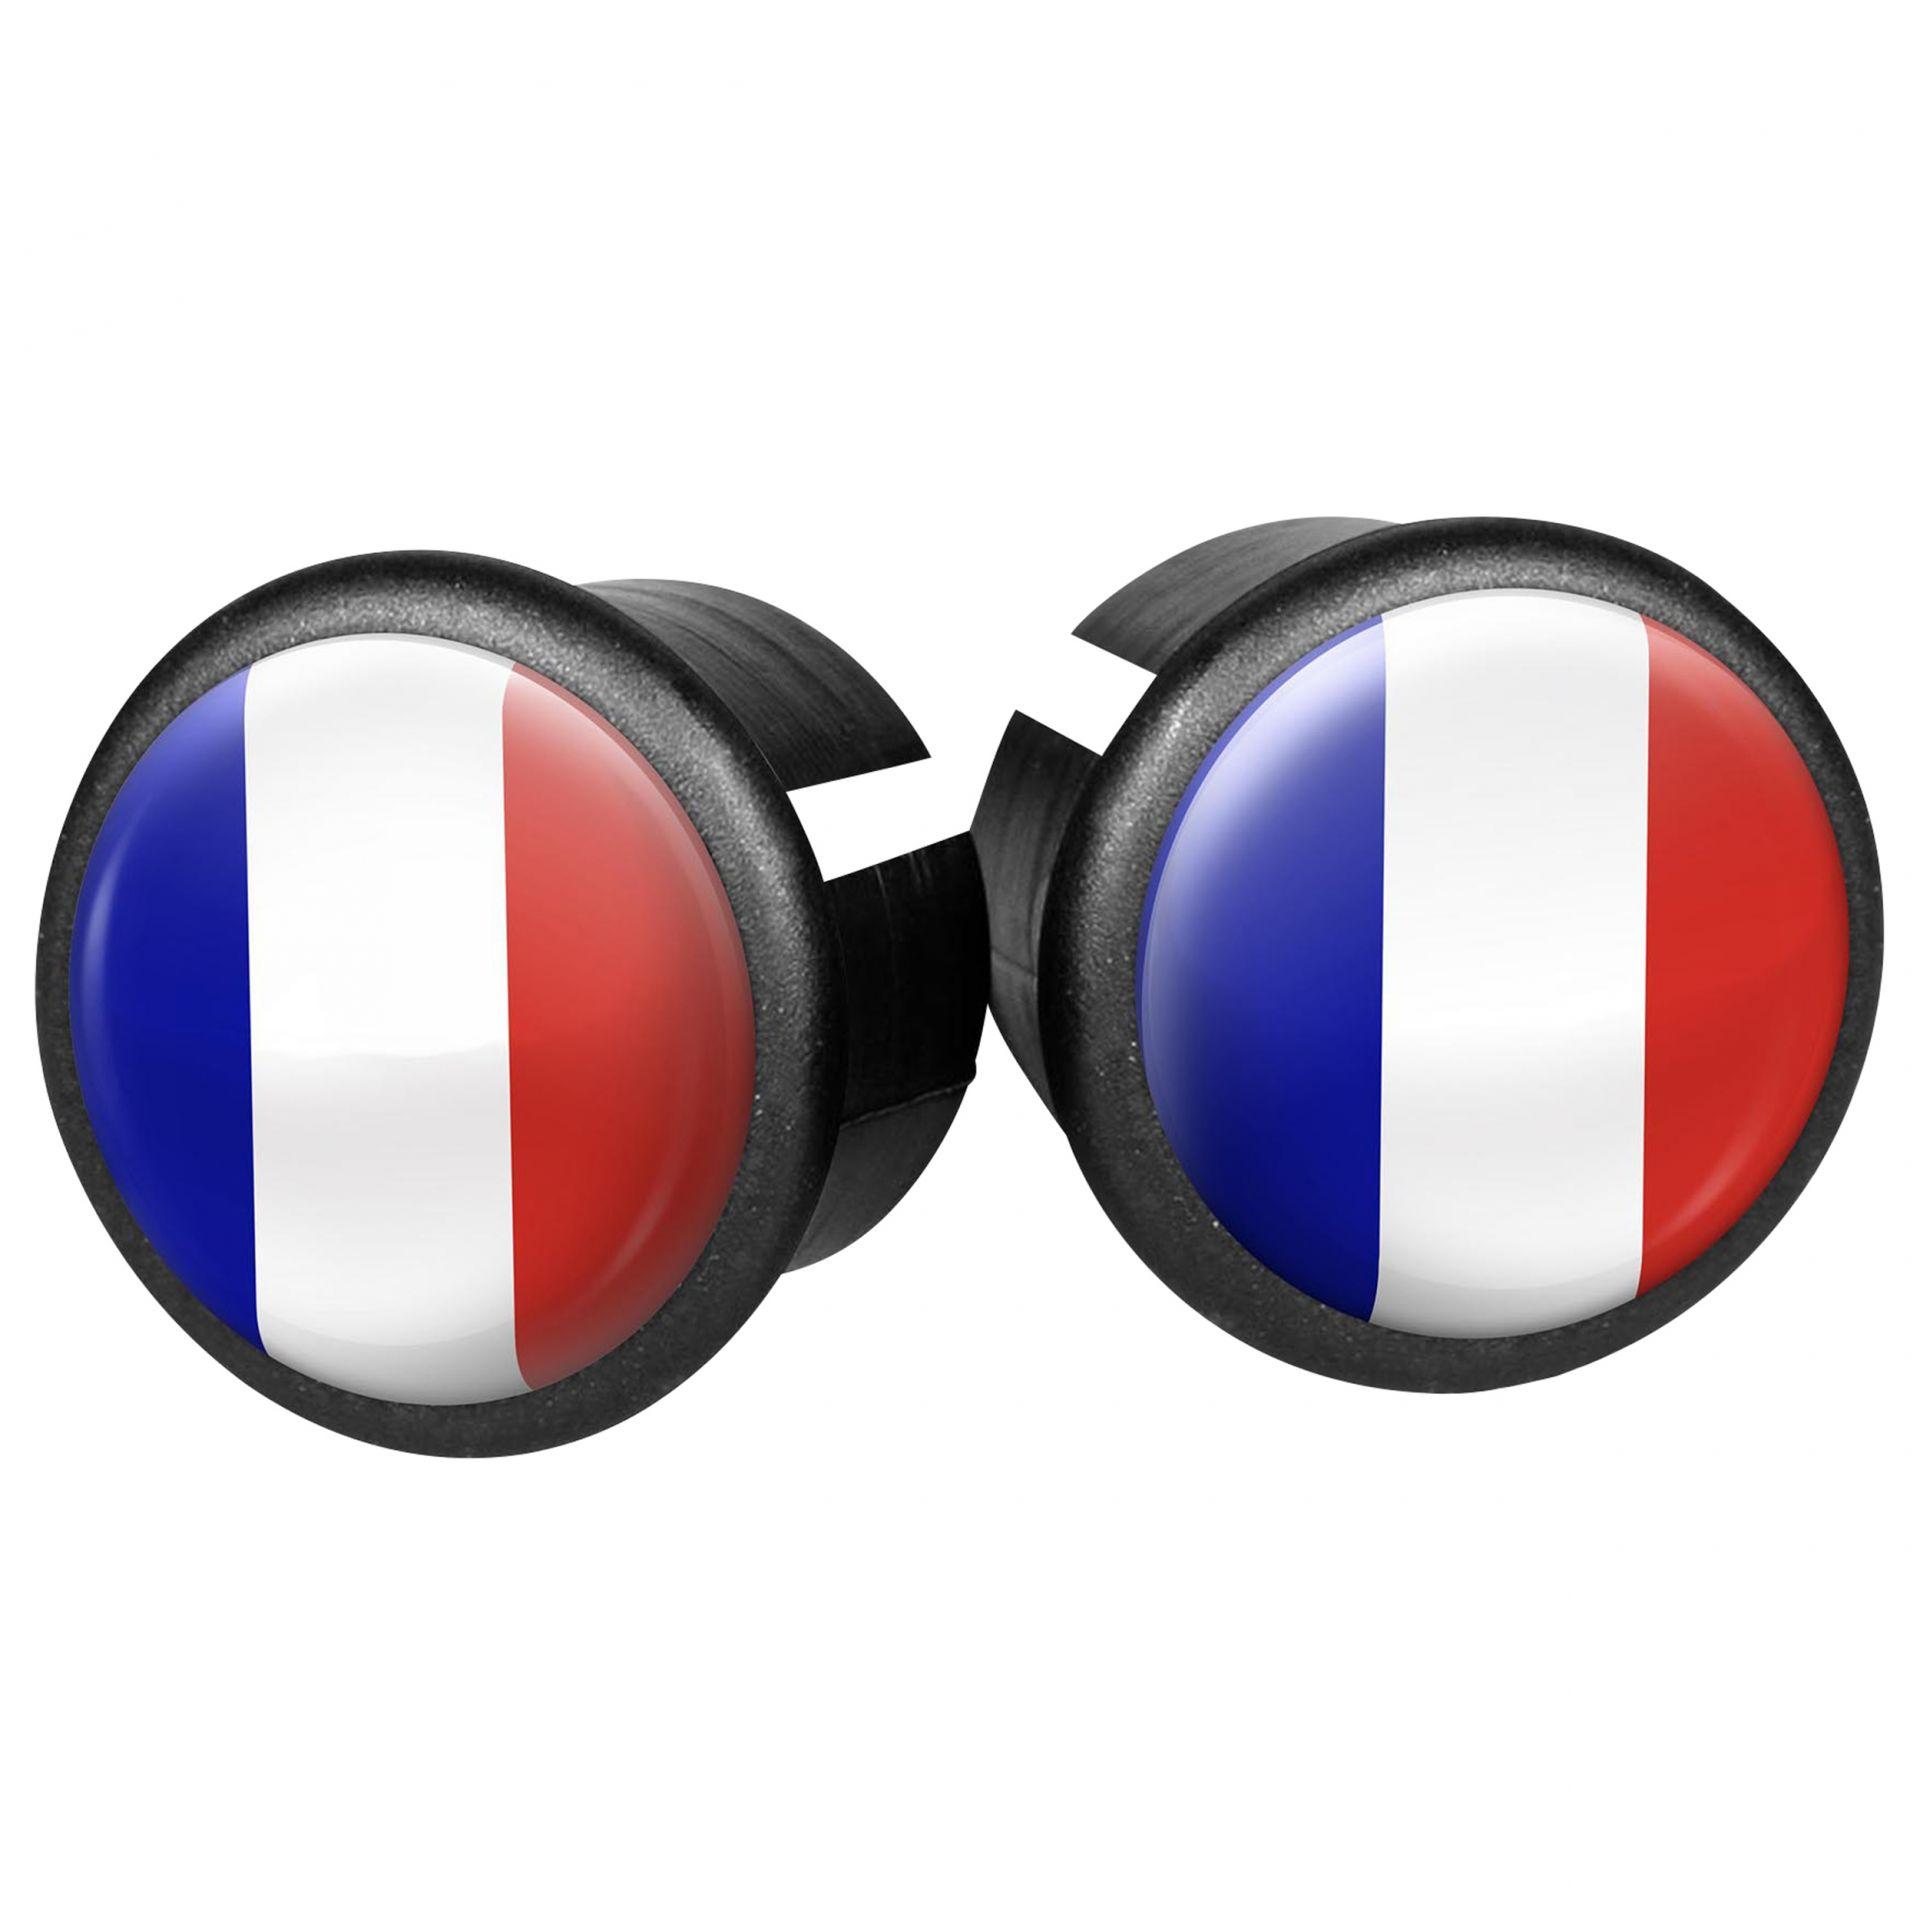 Bouchons de cintre VELOX Doming France